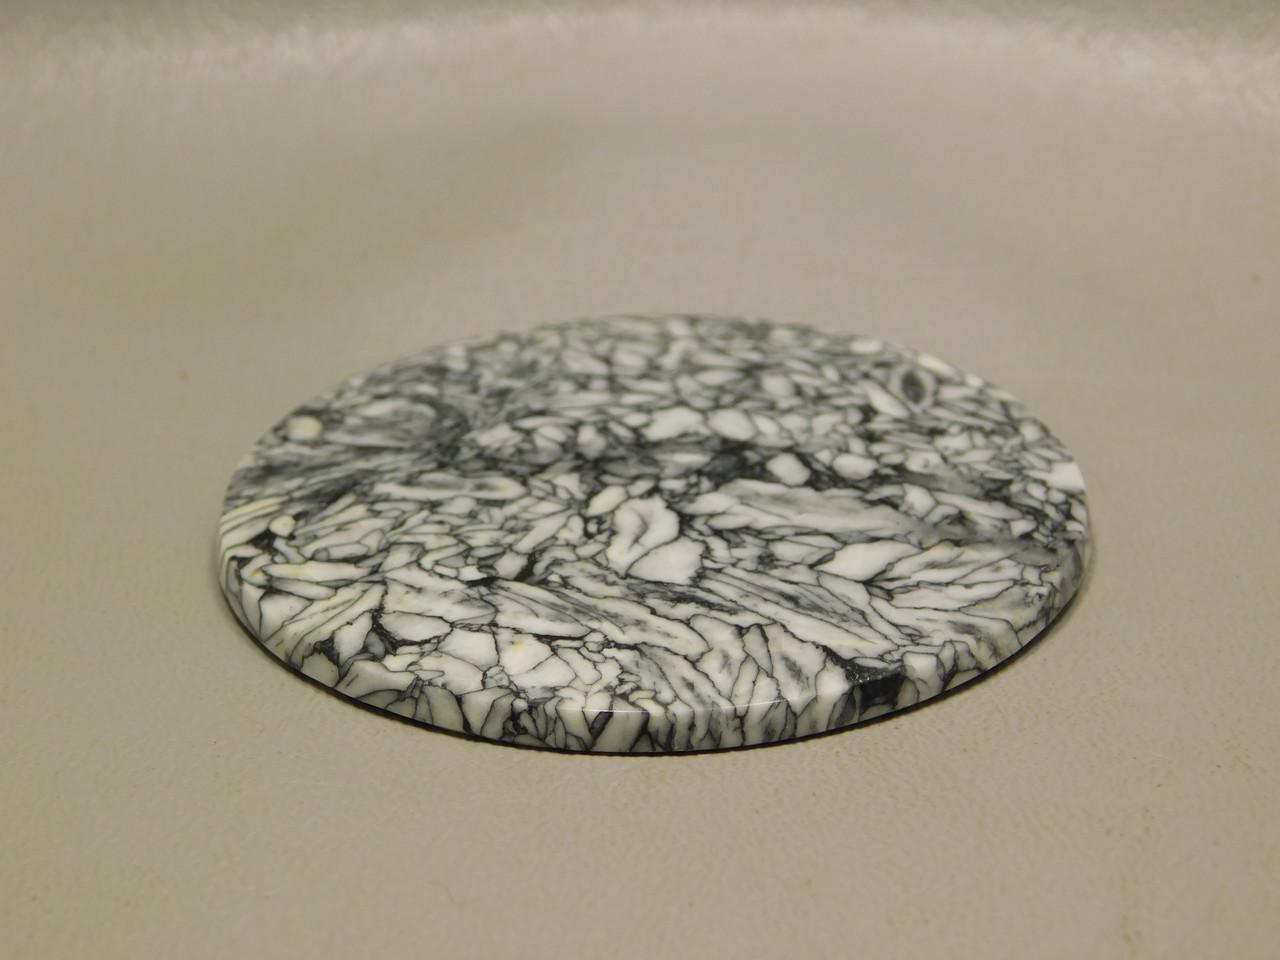 Pinolith or Pinolite Collector Gemstone Large Round 61 mm Cabochon #xl3